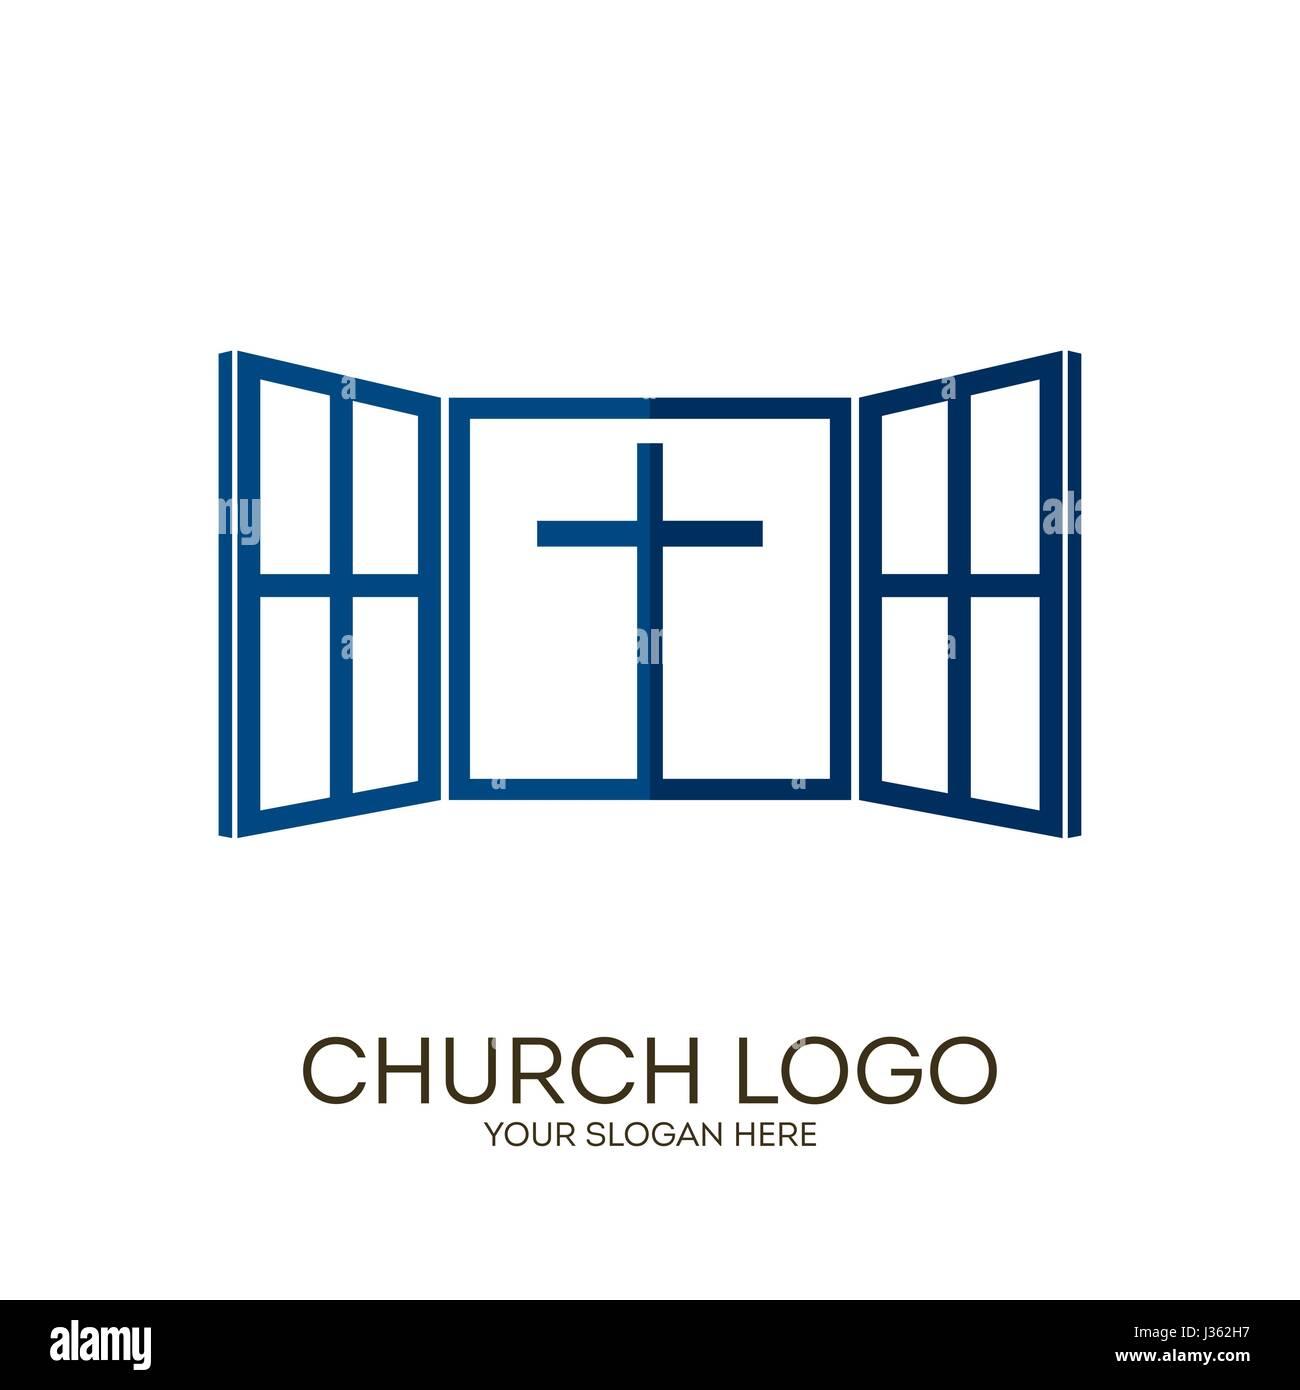 Church Logo Christian Symbols God Gives Us A Window Into The World